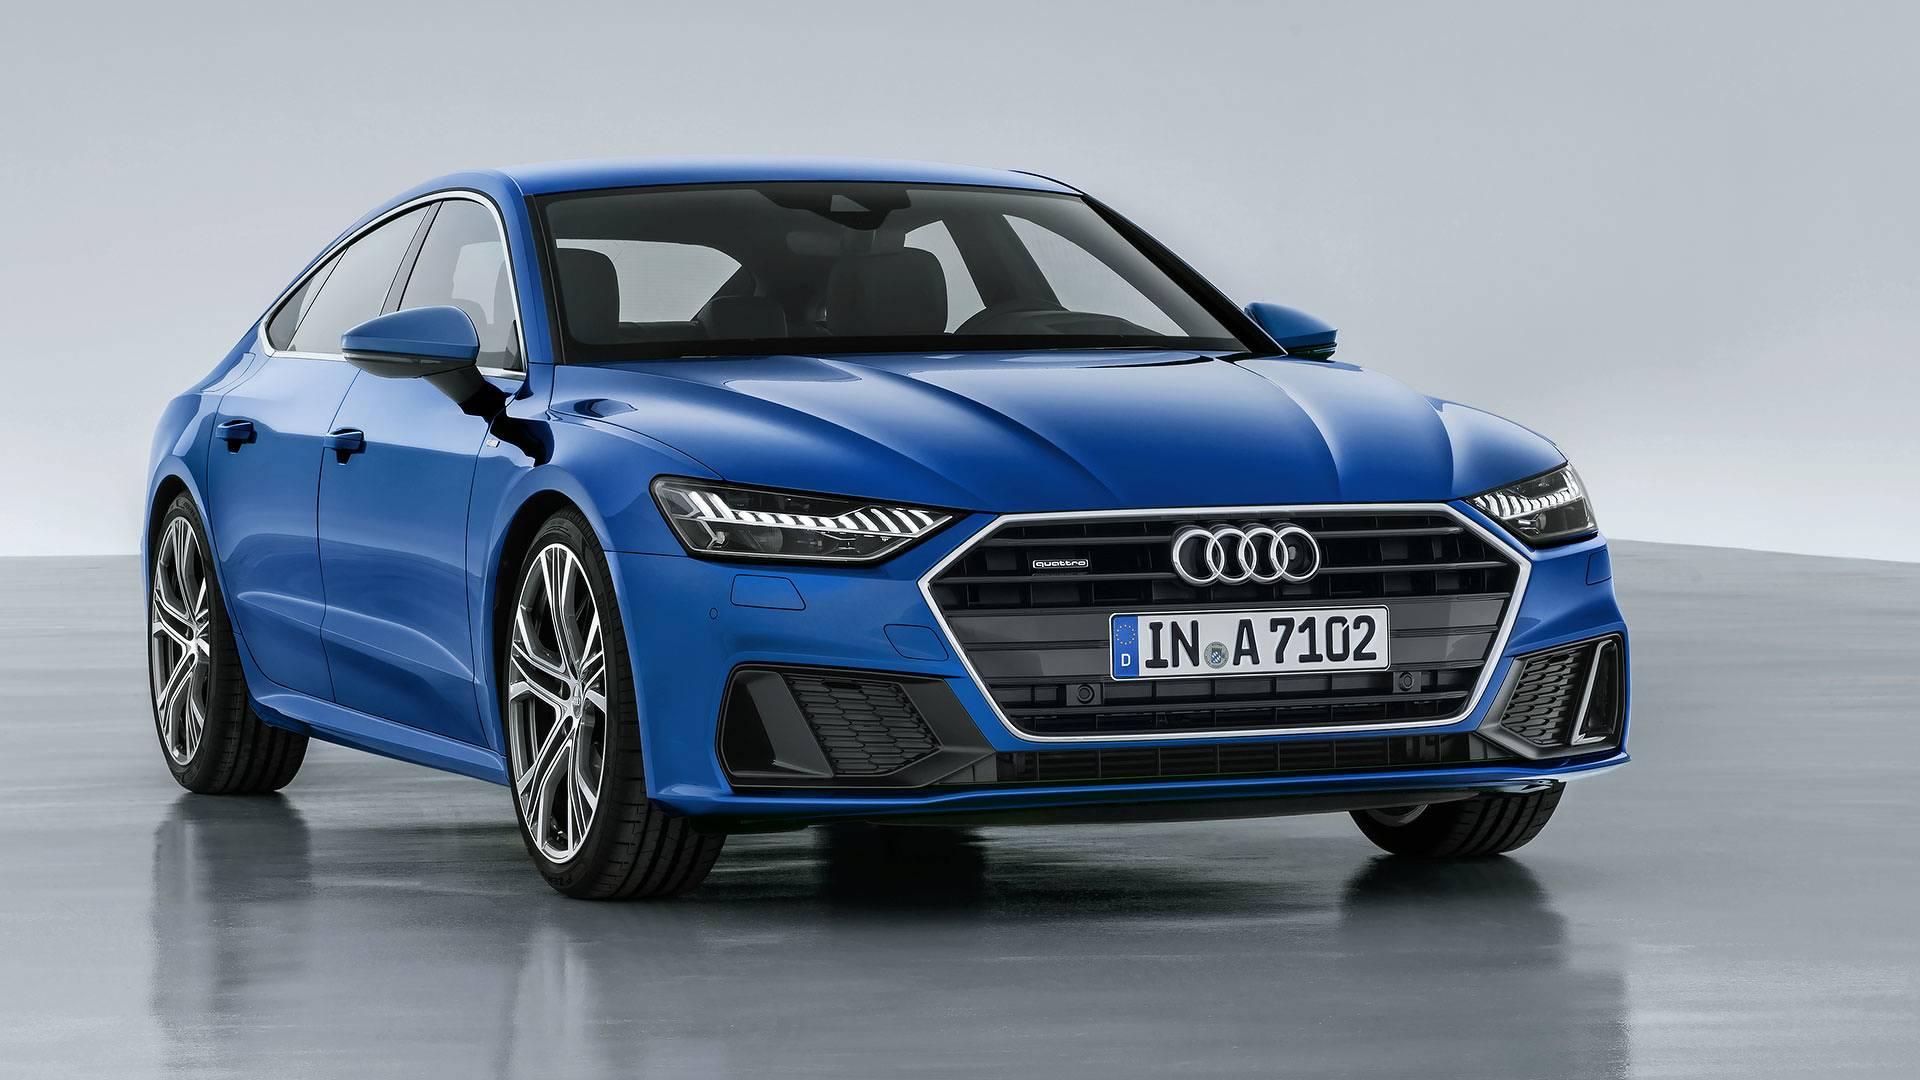 Reprogrammation Audi A7 55 3.0 TFSI 340